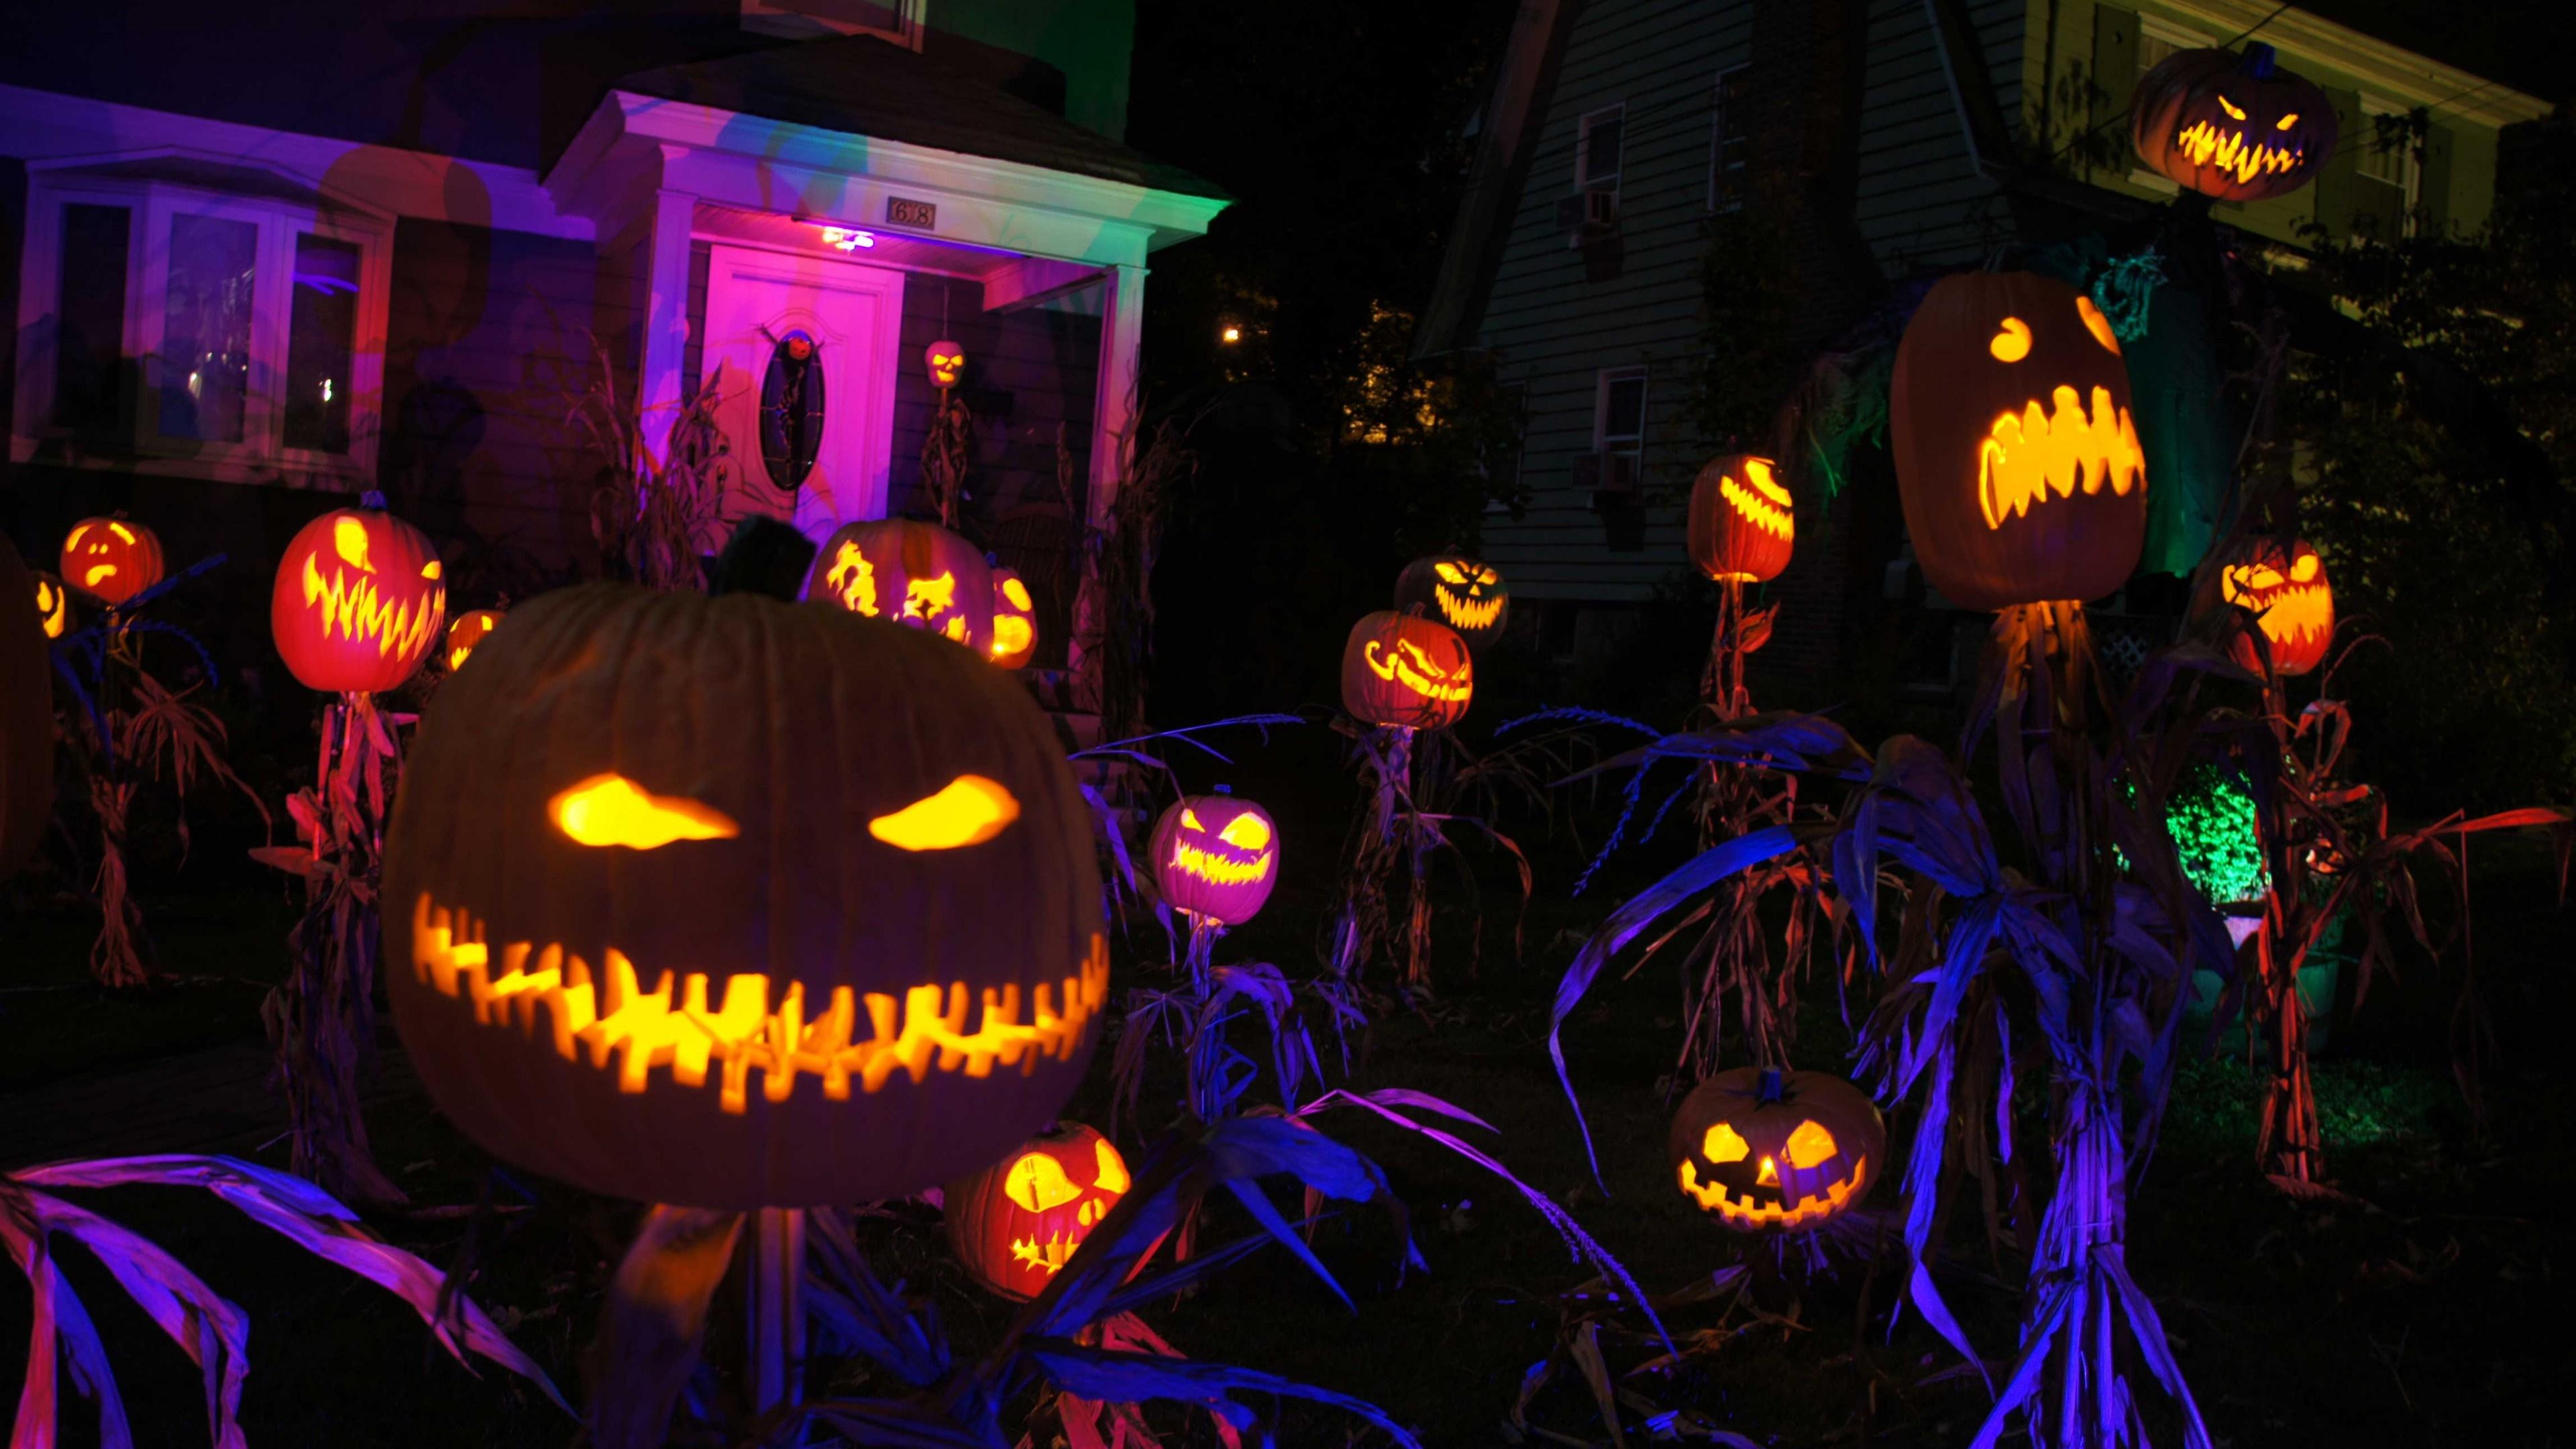 Spooky Jack O'lanterns in the garden wallpaper